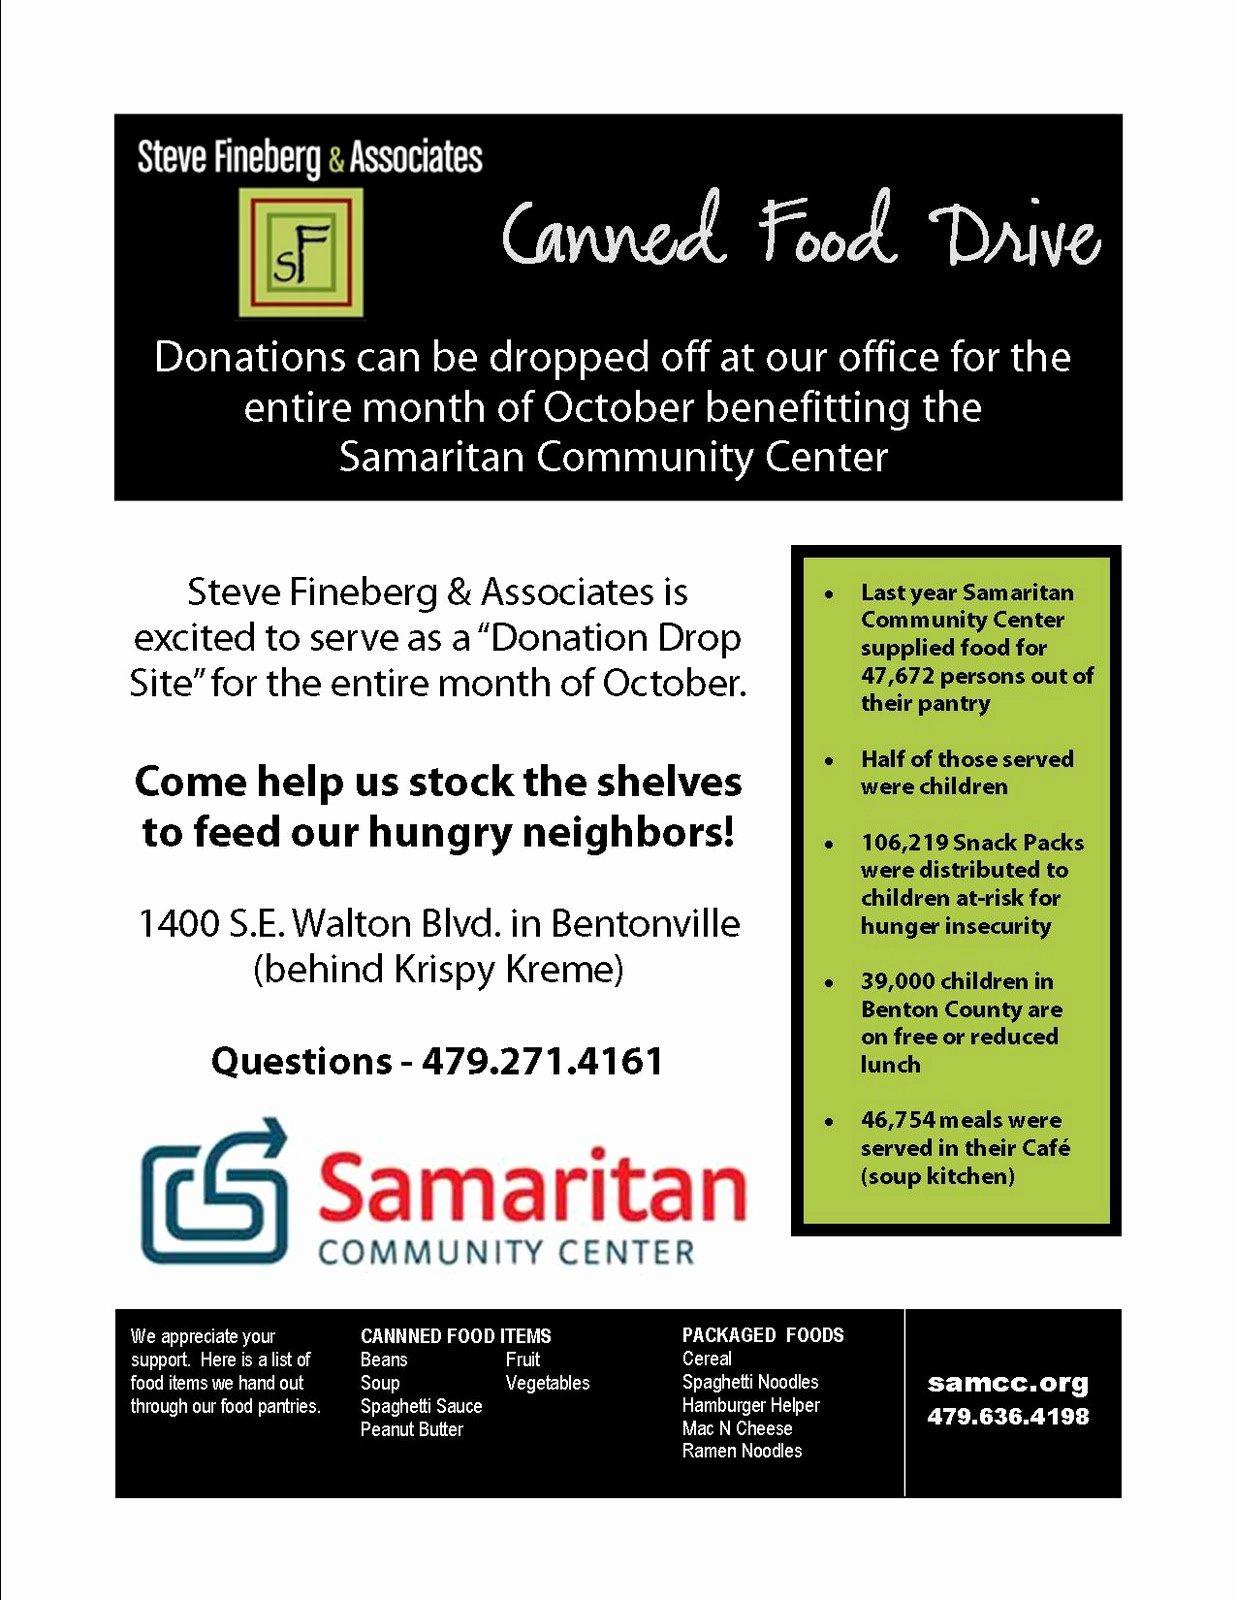 Canned Food Drive Flyer Inspirational Steve Fineberg & associates Corporate Responsibility